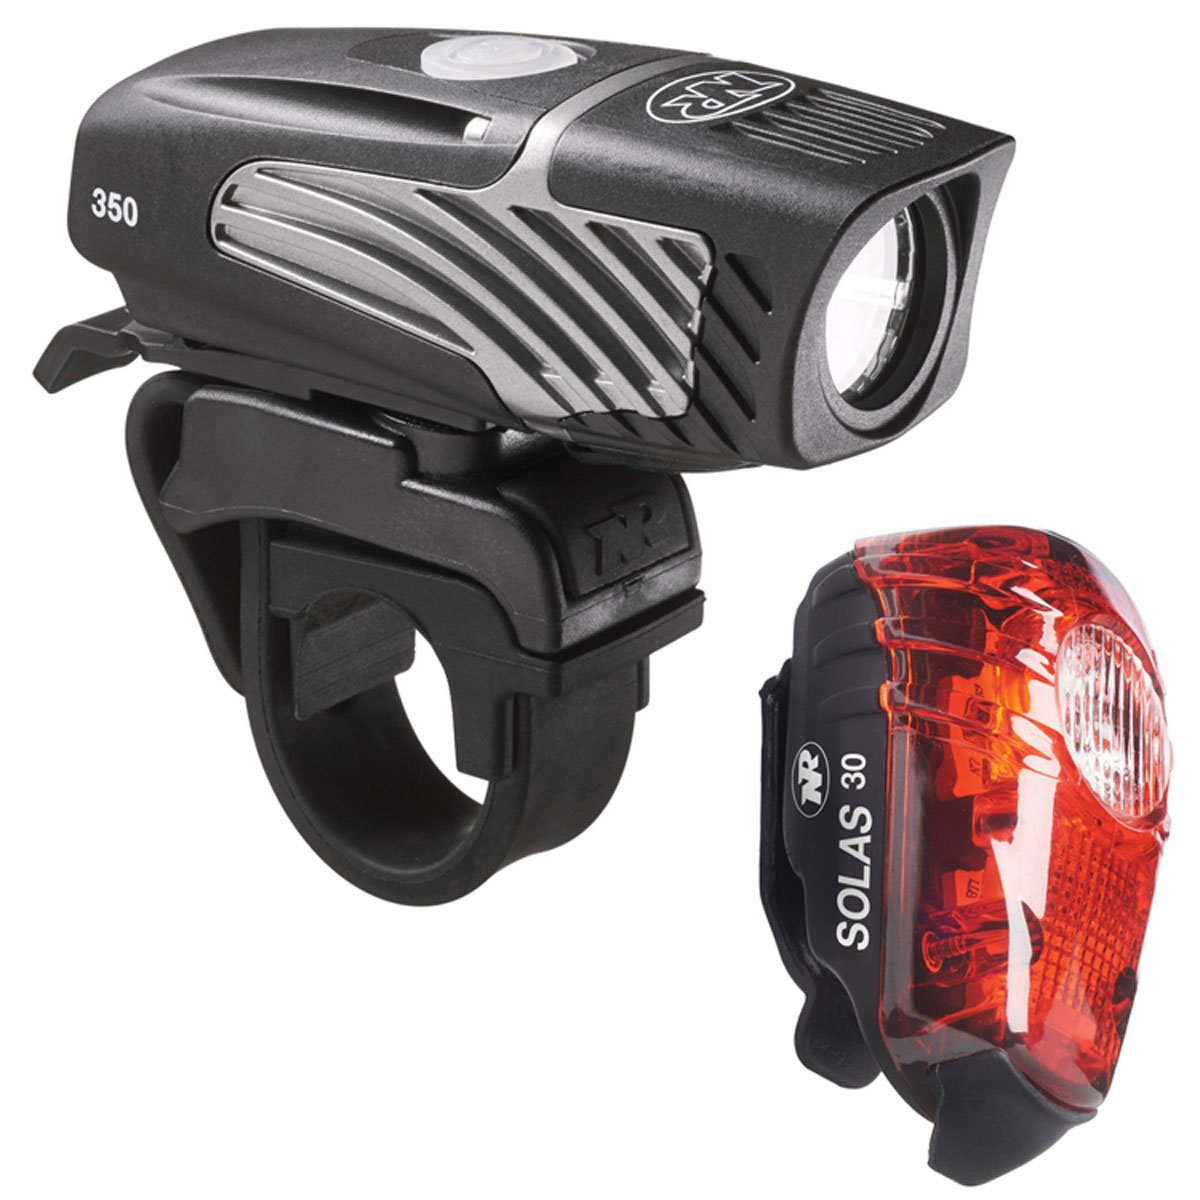 NiteRider Lumina Micro 350//Solas 30 USB Combo Bike Light Pro-Motion Distributing Direct 6723